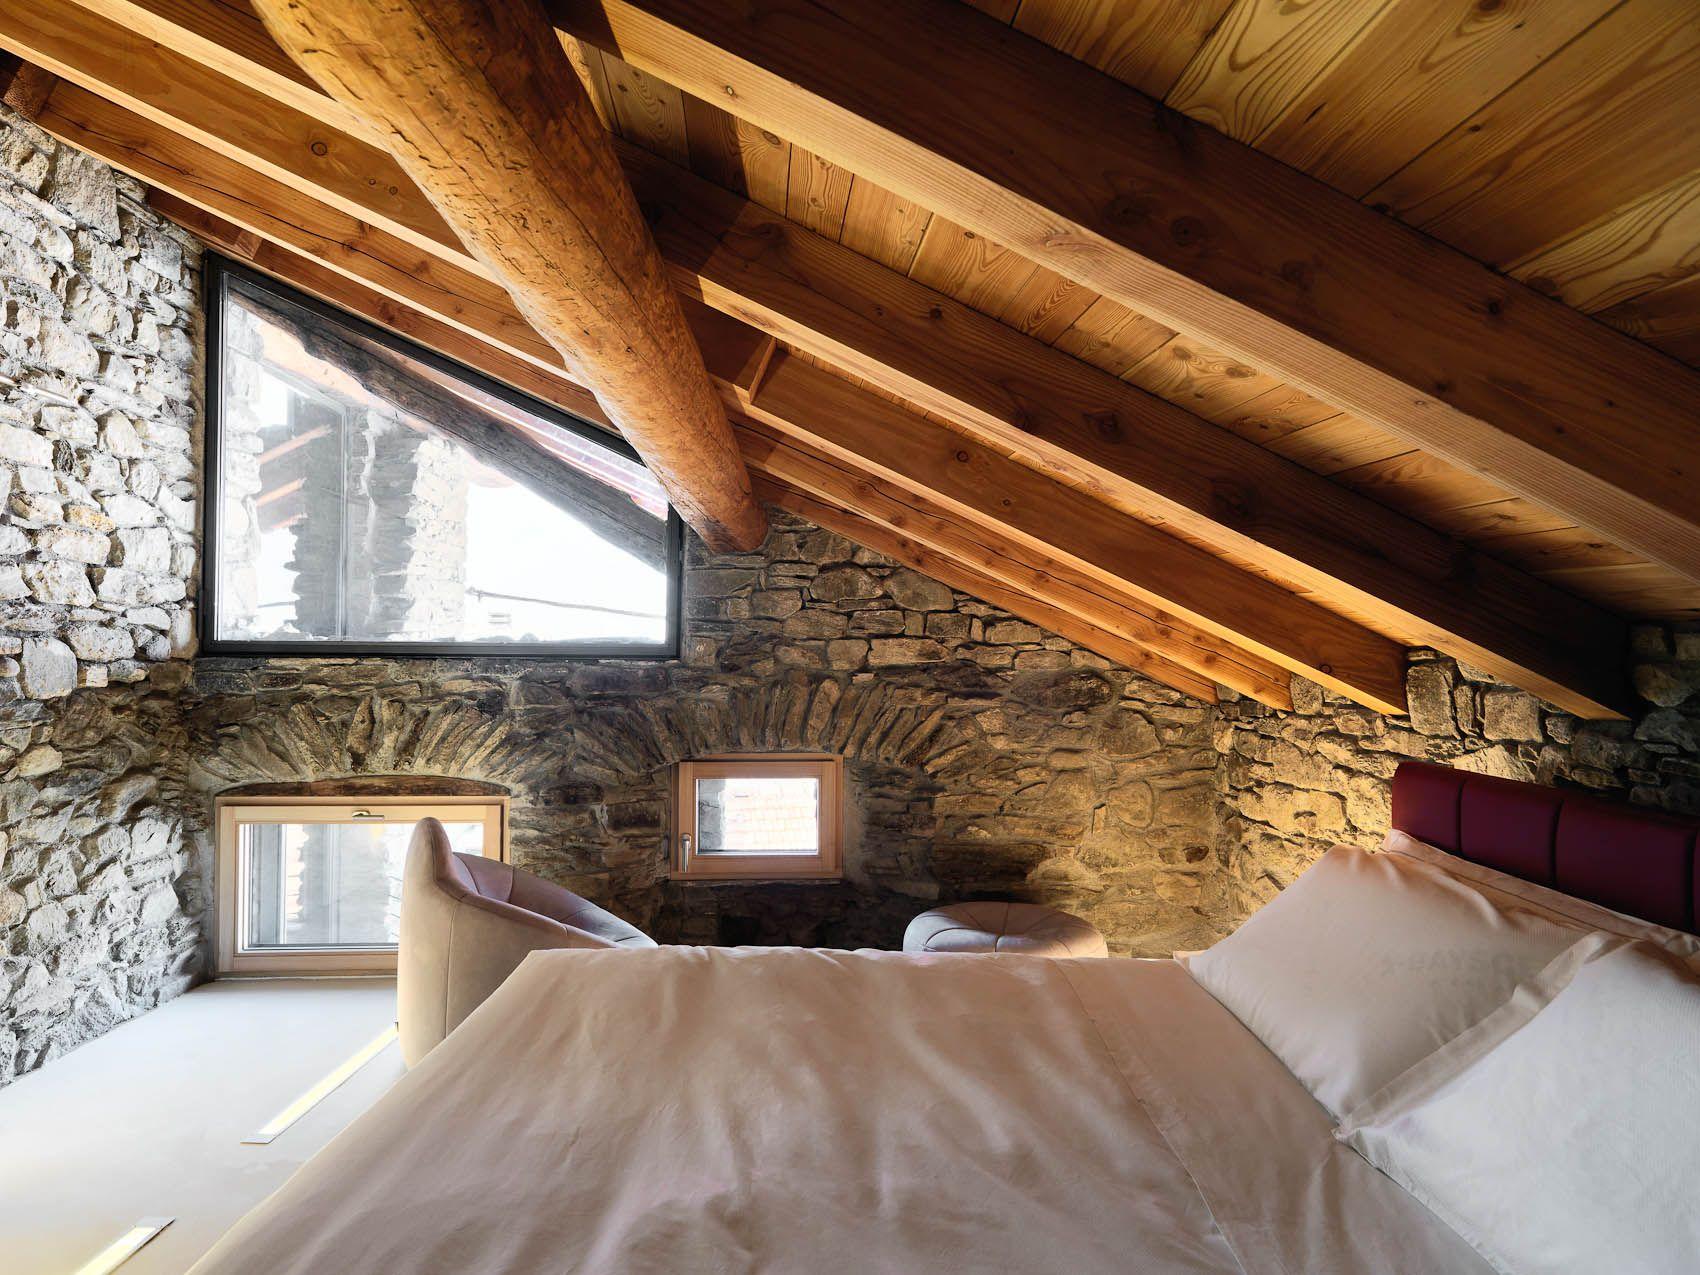 Chalet Style Arhitecture Interior Home Design Apartment